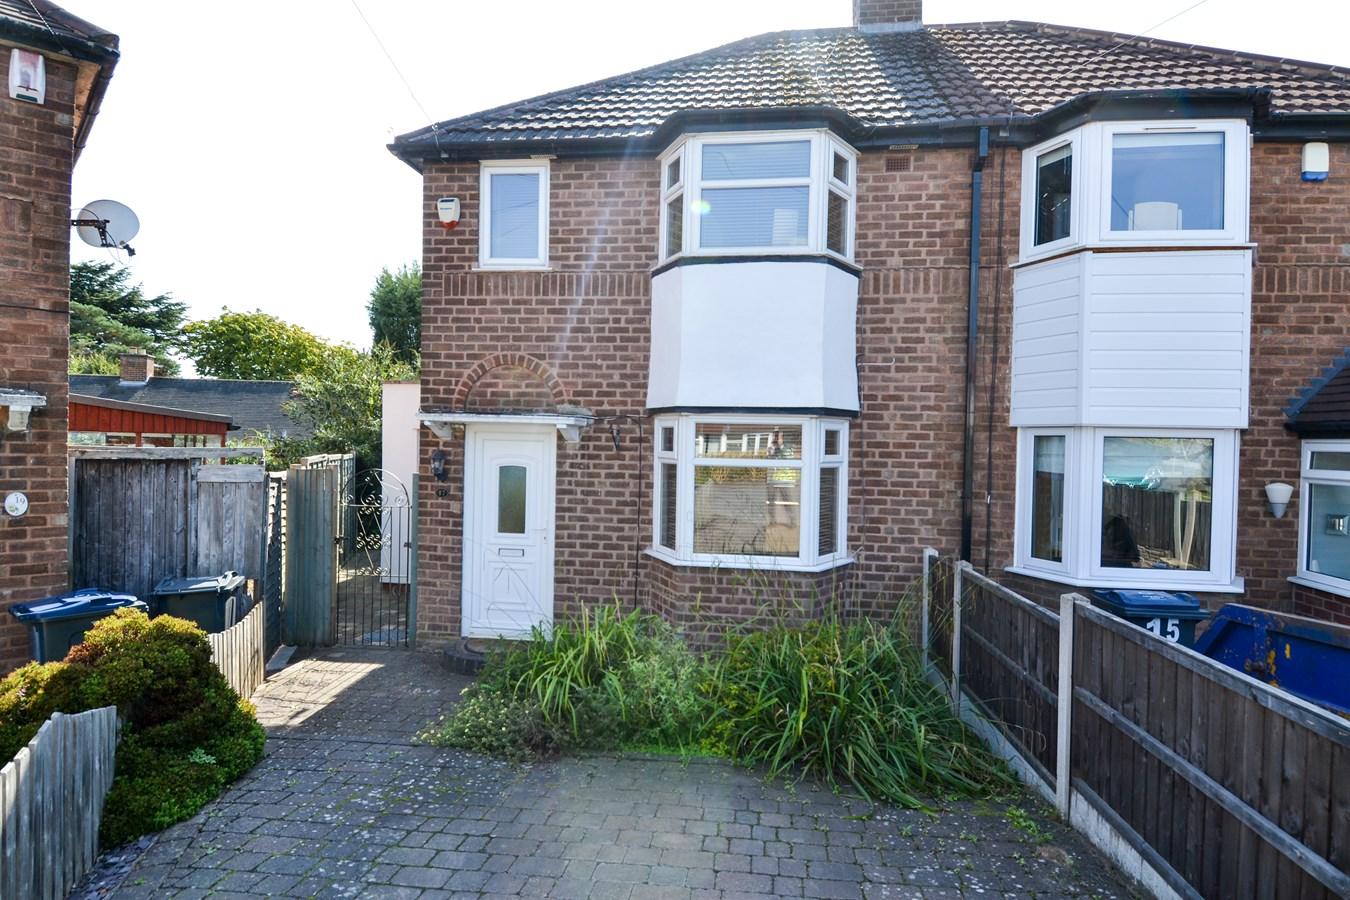 3 Bedroom Property For Sale In Kings Green Avenue Kings Norton Birmingham B38 Offers In The Region Of 219950